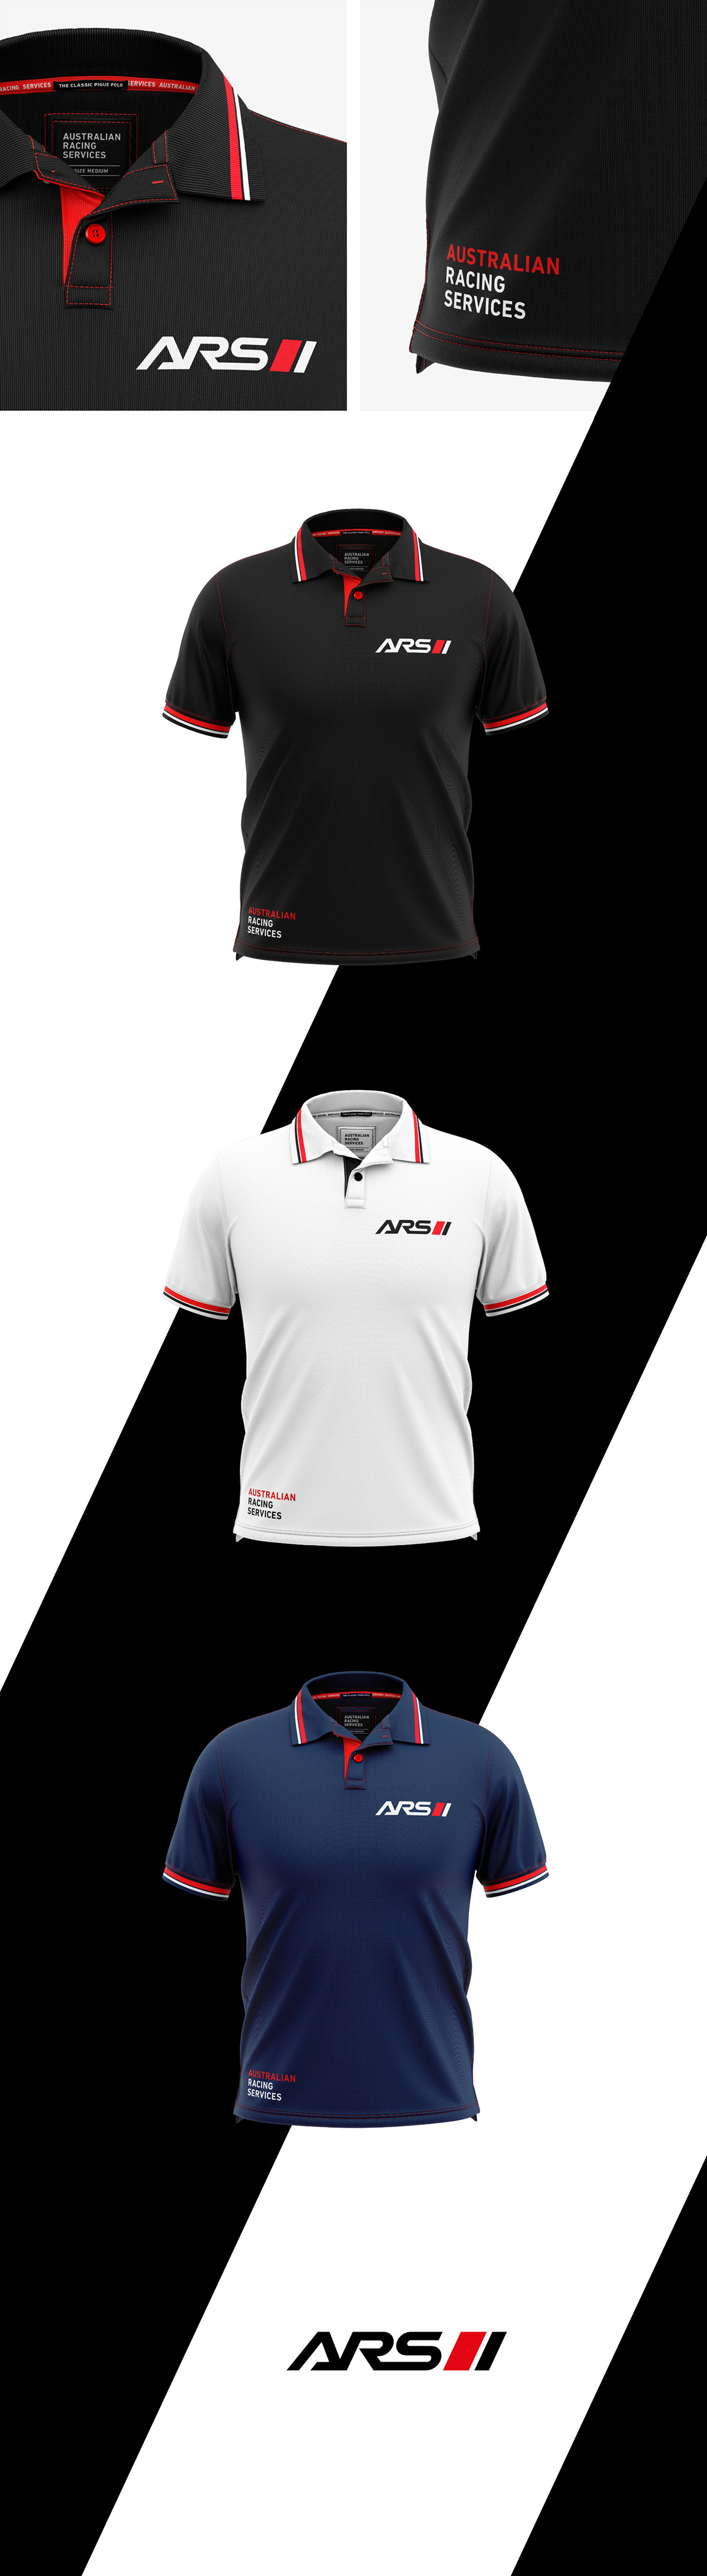 branding  fast logo Motorsport motorsports Racing racing design speed visual identity